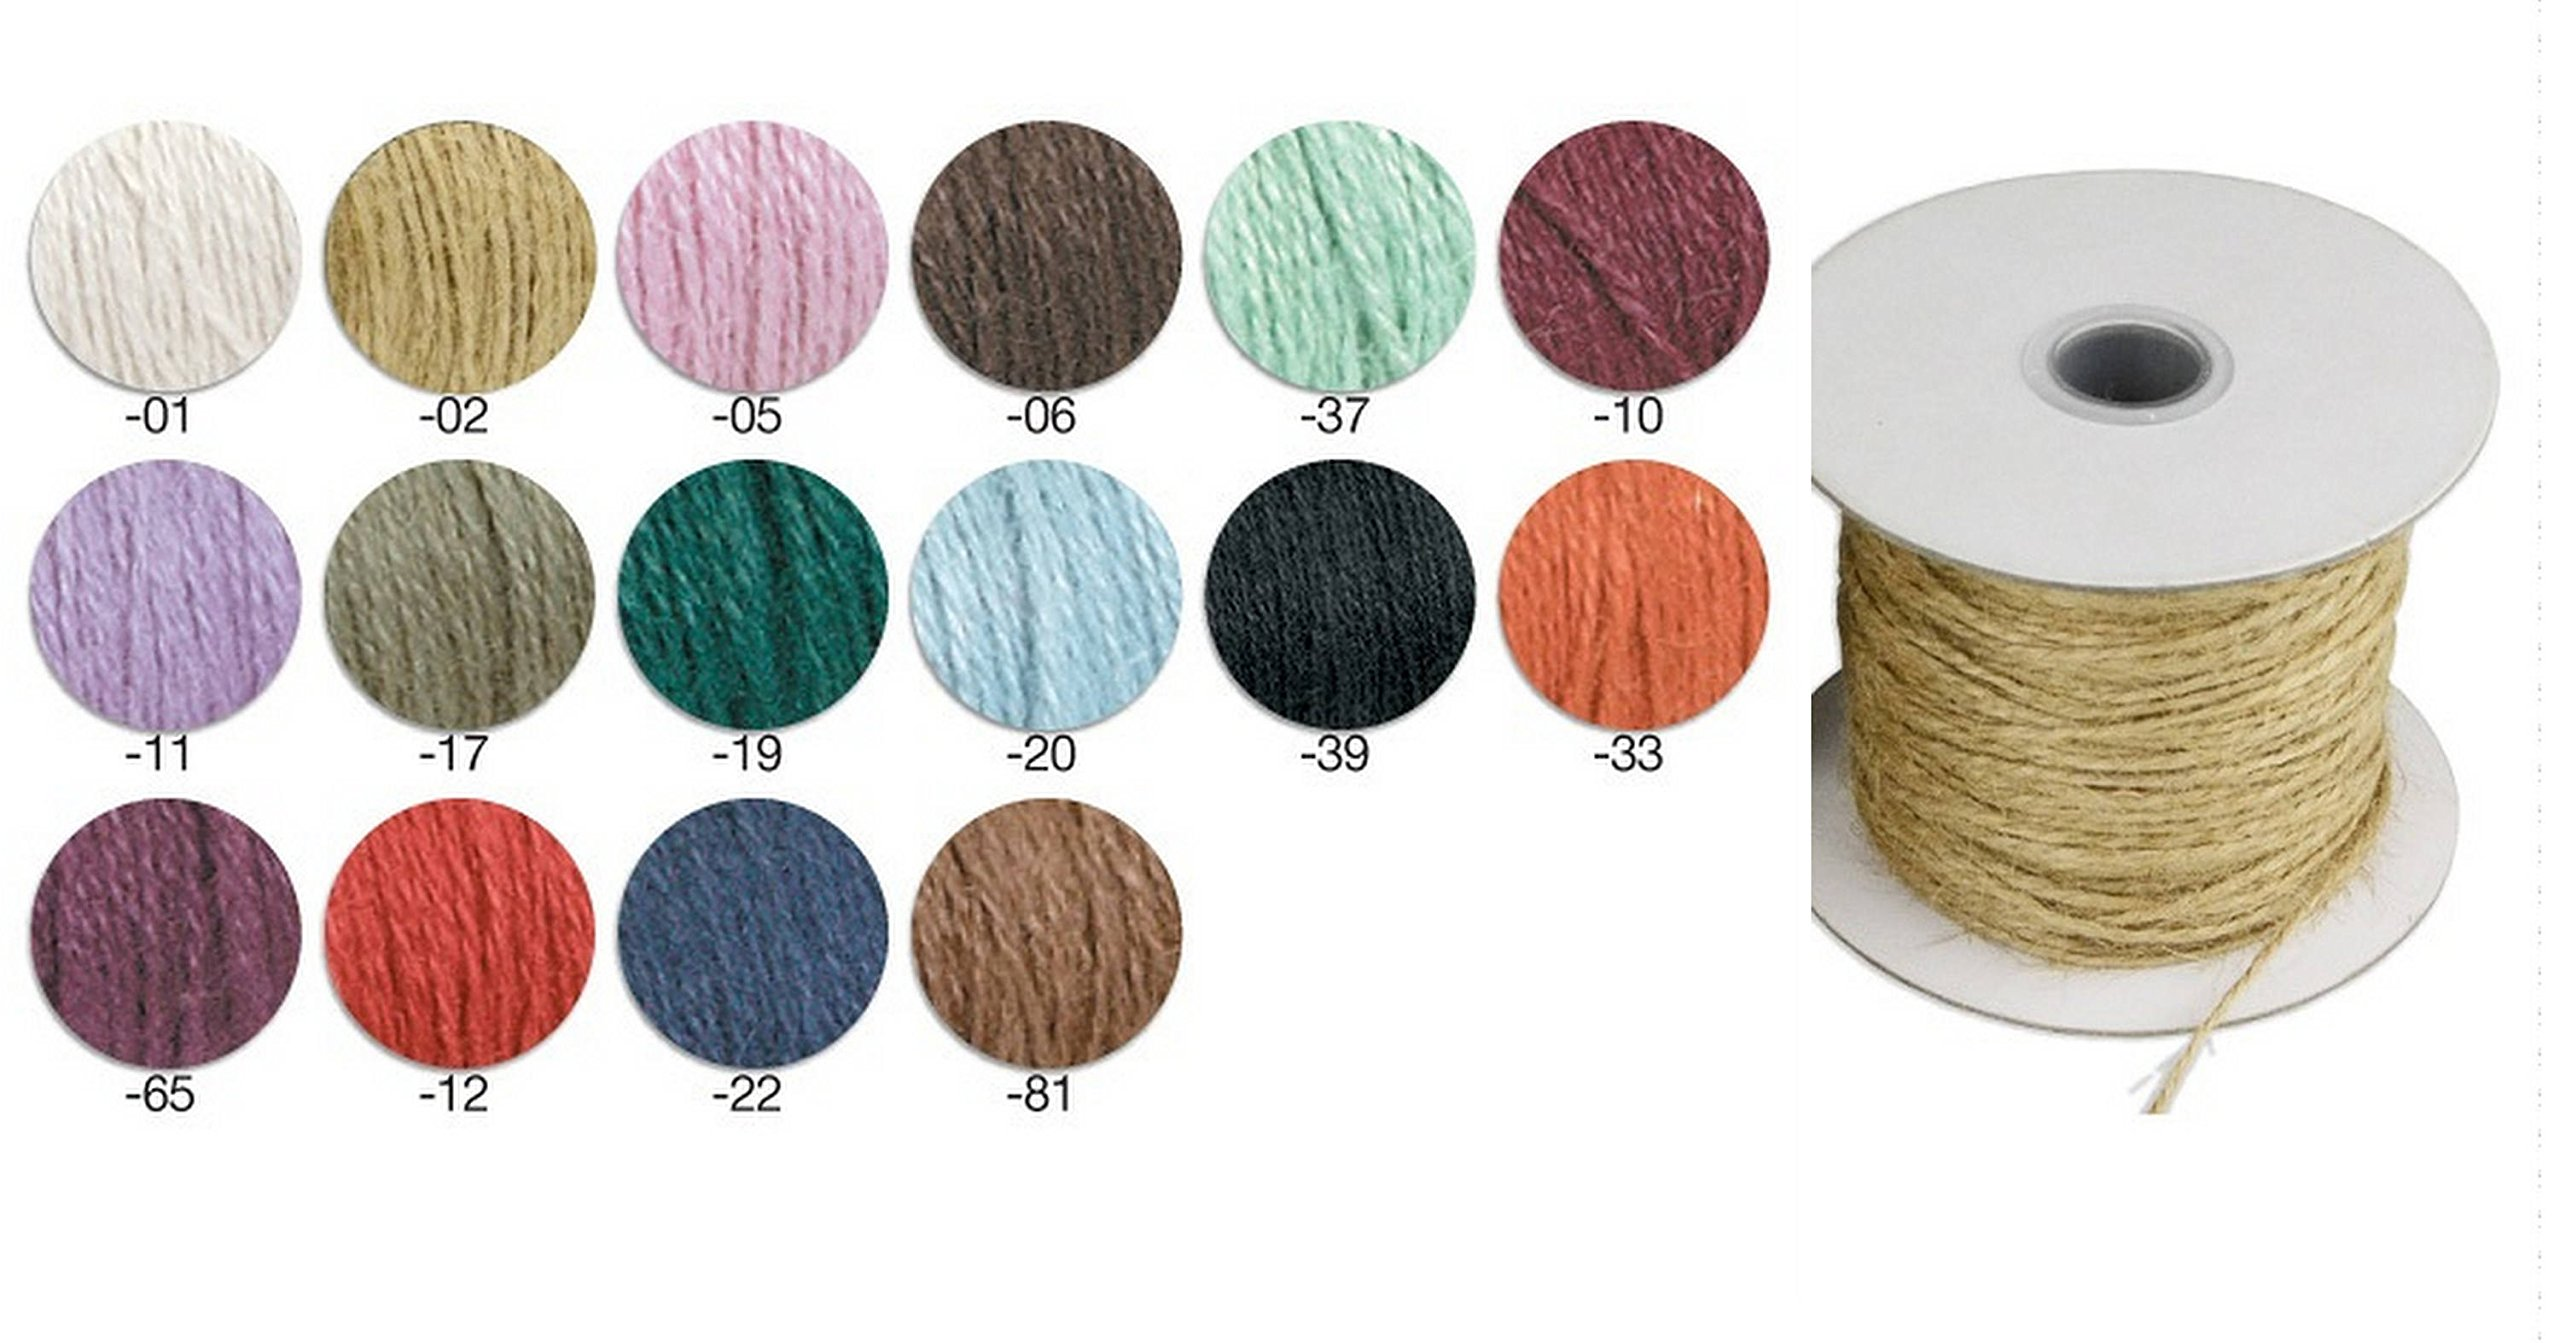 PoshNPretty Natural Burlap Jute twine Cord - 1/16-Inch 1.5mm x 100 yards - Choose Color (Black)